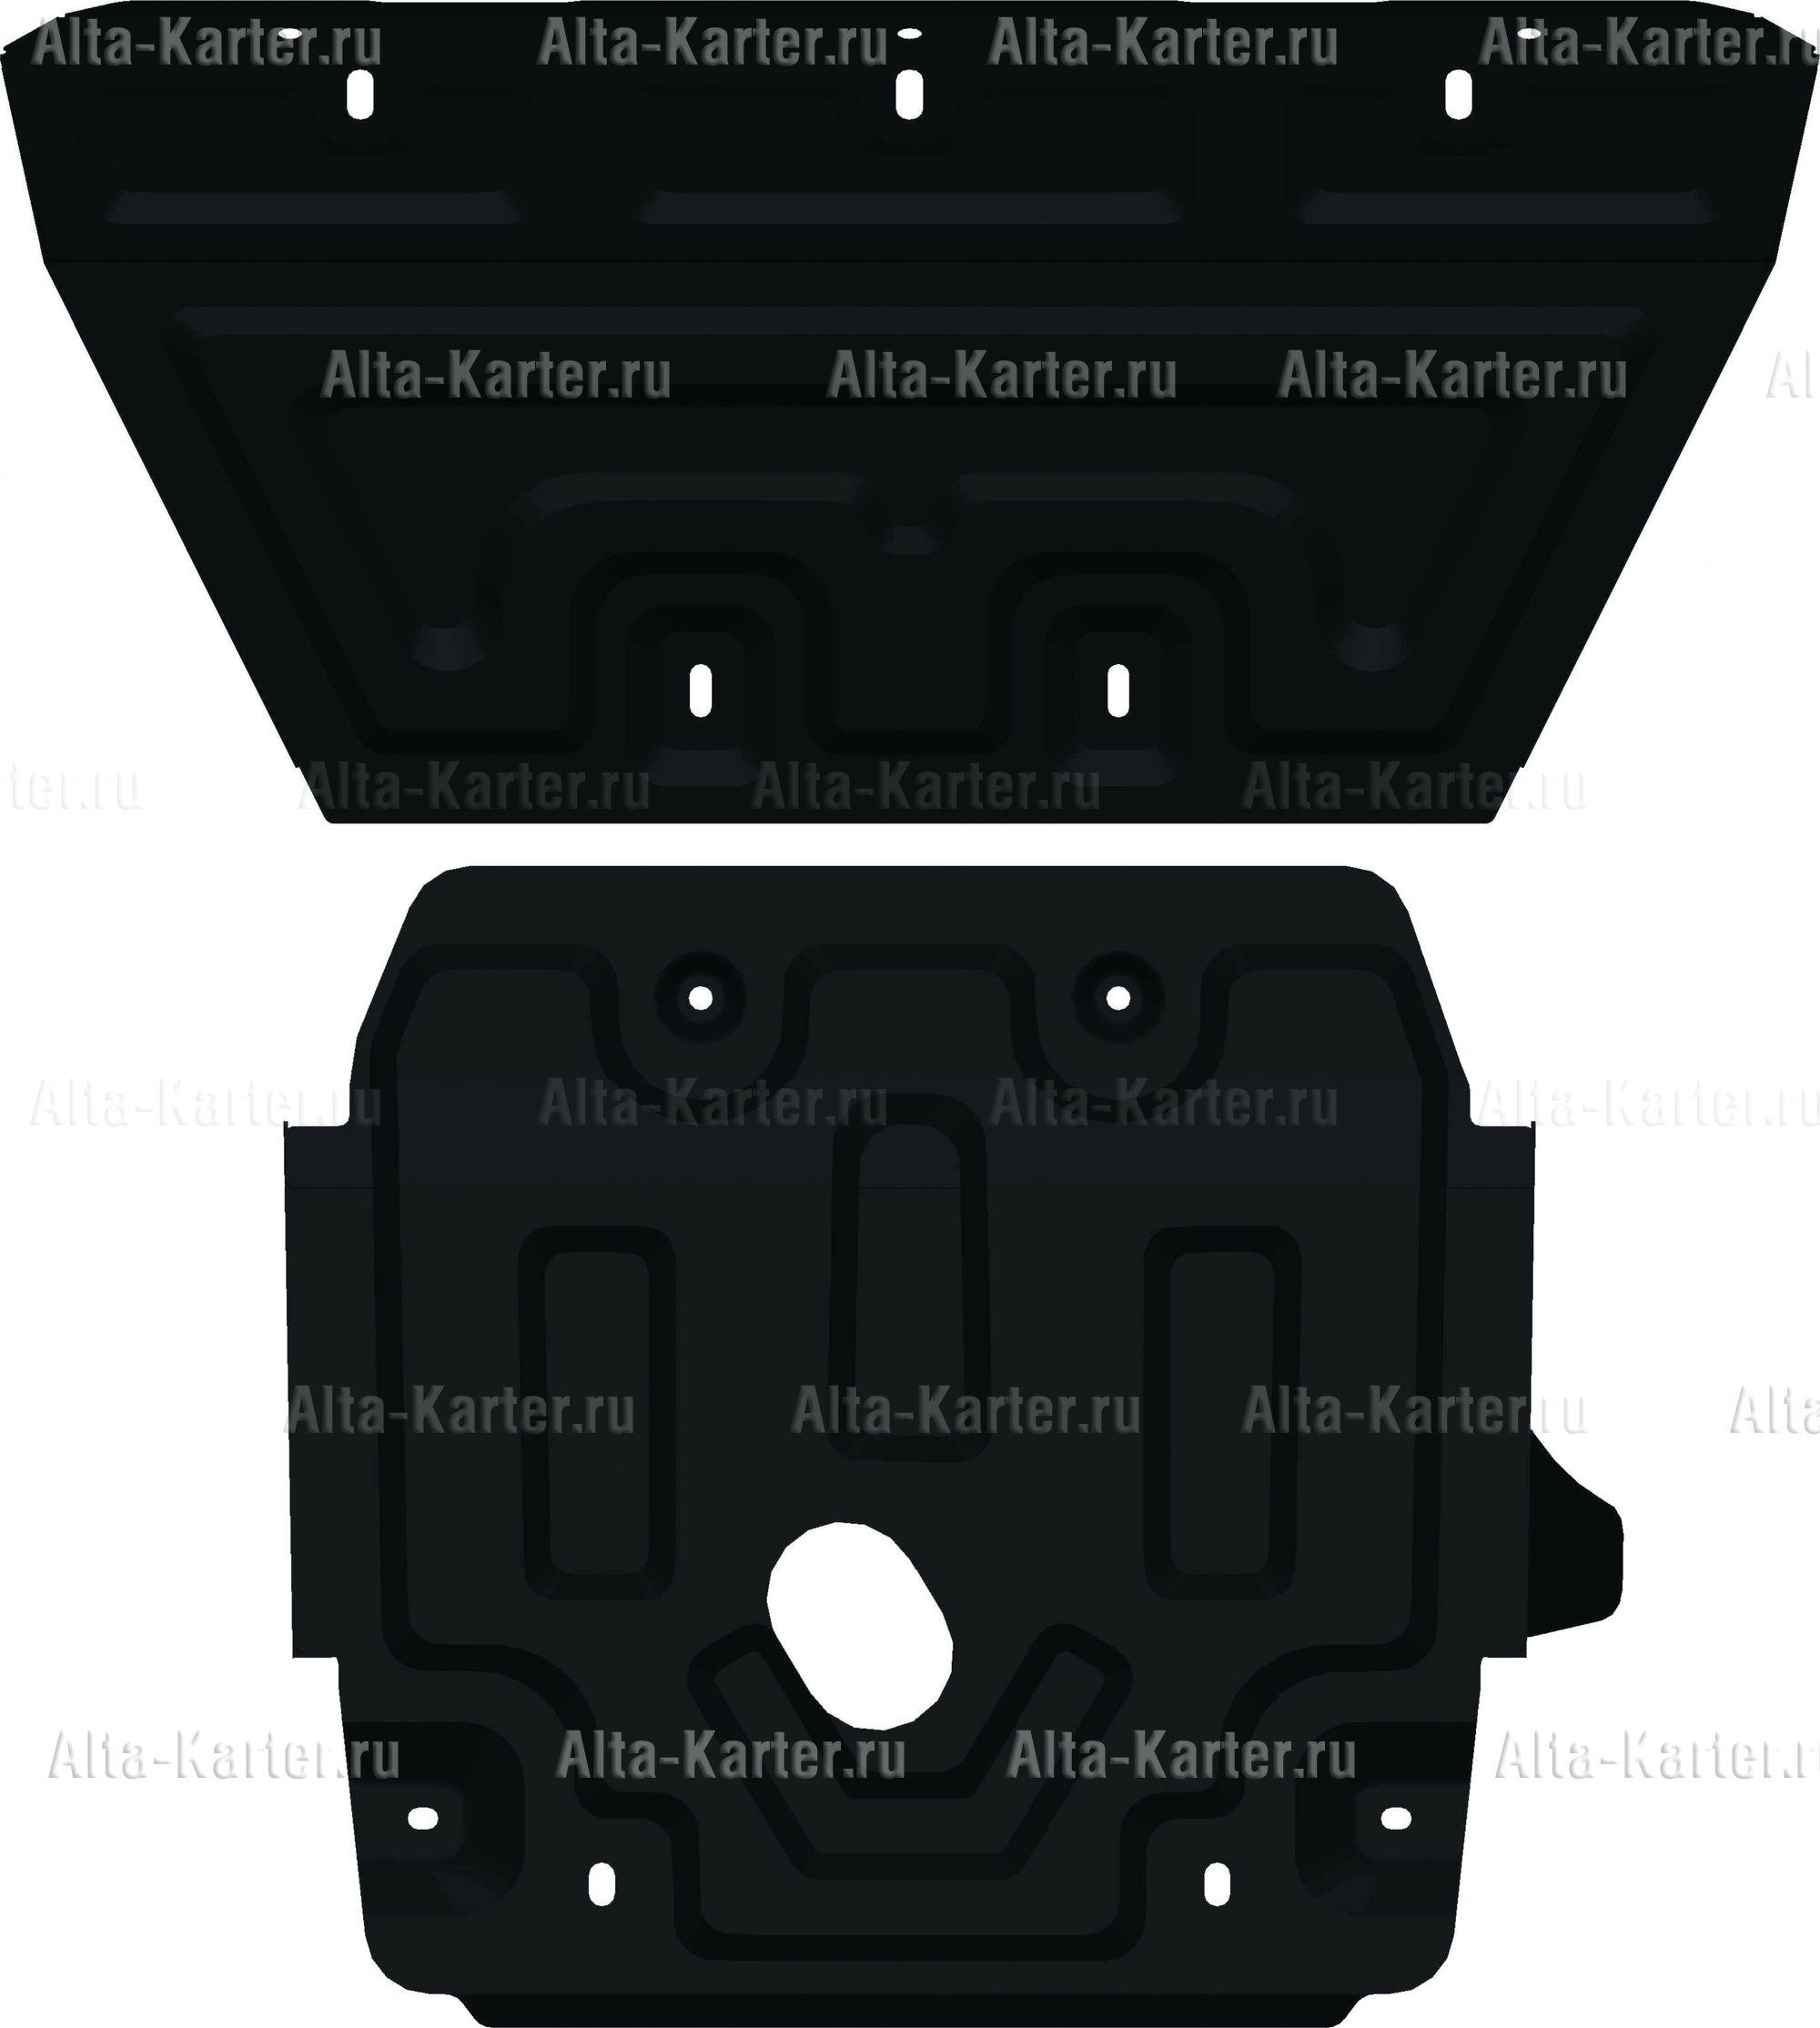 Защита Alfeco для картера и рулевых тяг Toyota Land Cruiser 150 Prado 2009-2021. Артикул ALF.24.40 st